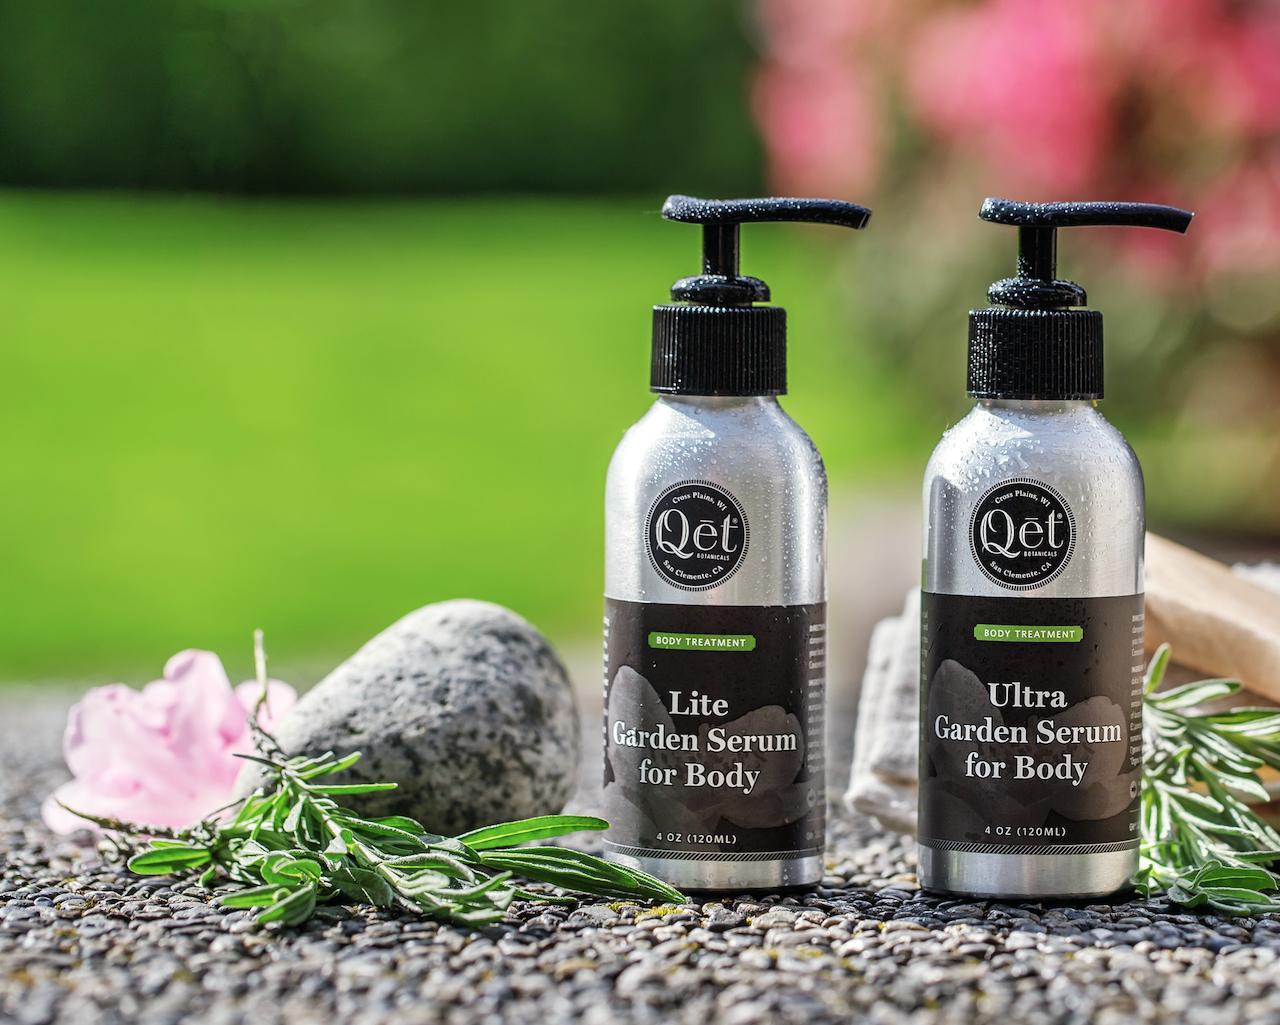 Qet-Botanicals-All-Natural-Moisturizing-Body-Oils